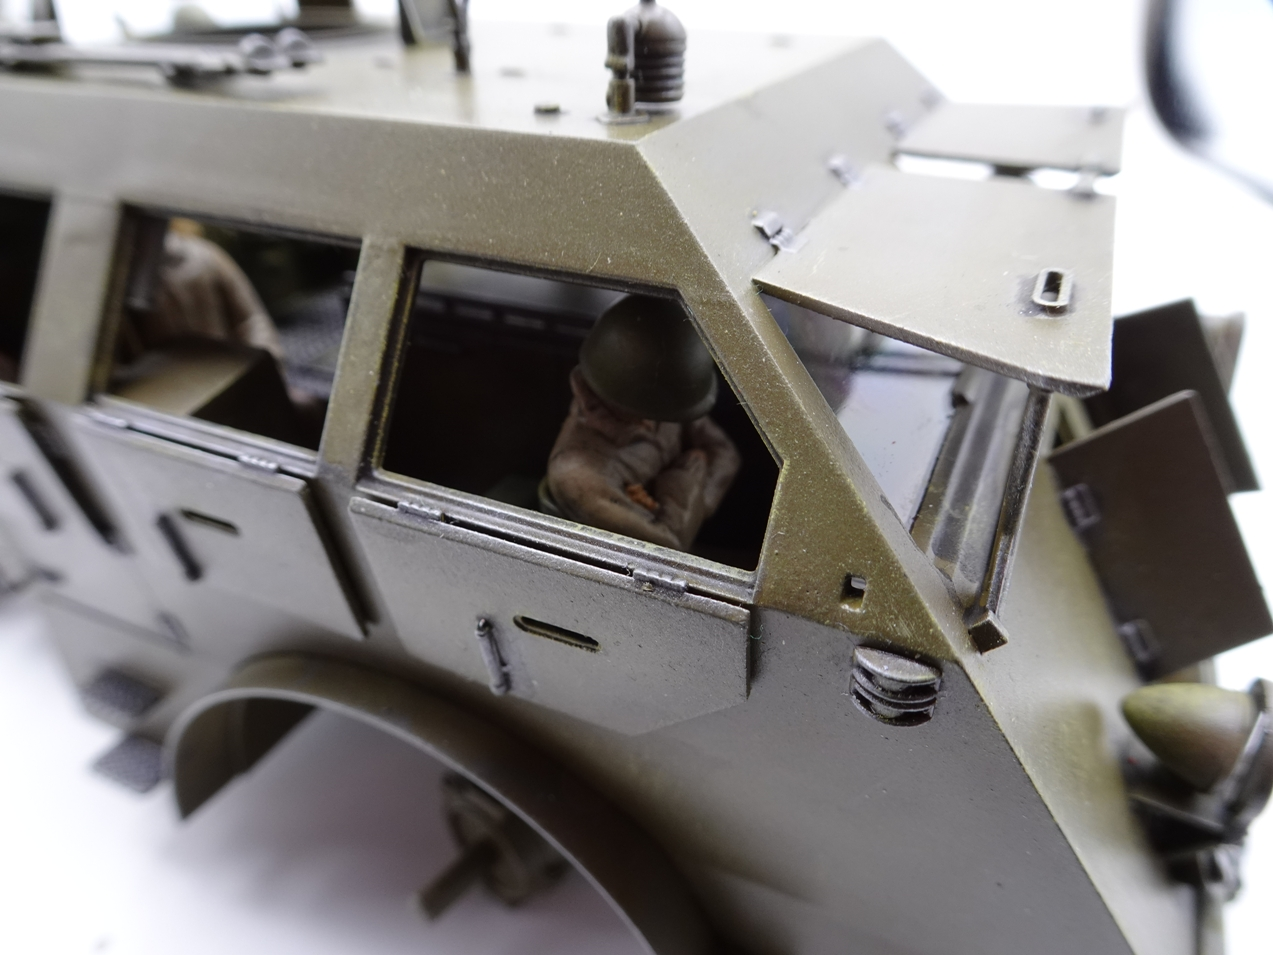 [Tamiya 1/35] M26 Armored tank recovery vehicle réf. 35244 - Page 3 M26-1810-4